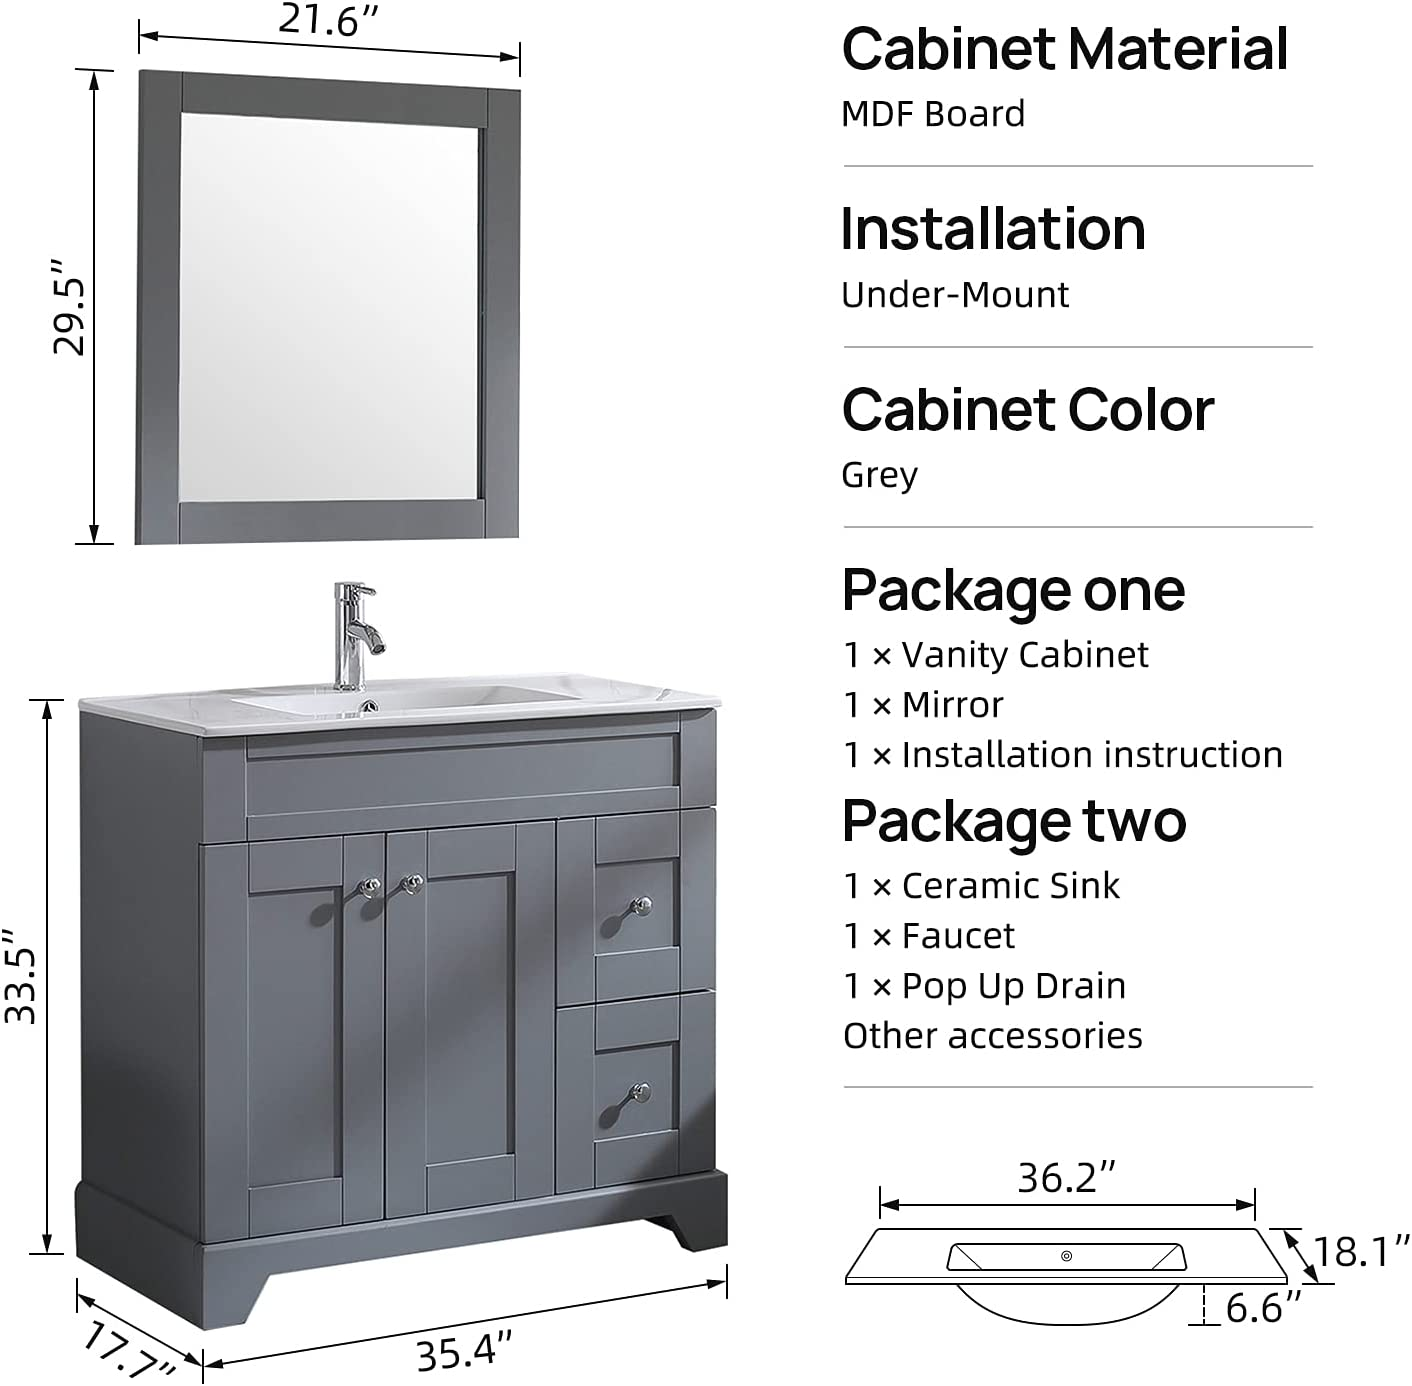 Buy Wonline 36 Grey Bathroom Vanity And Sink Combo Cabinet Undermount Ceramic Vessel Sink Chrome Faucet Drain With Mirror Vanities Set Online In Turkey B08xb52l3h